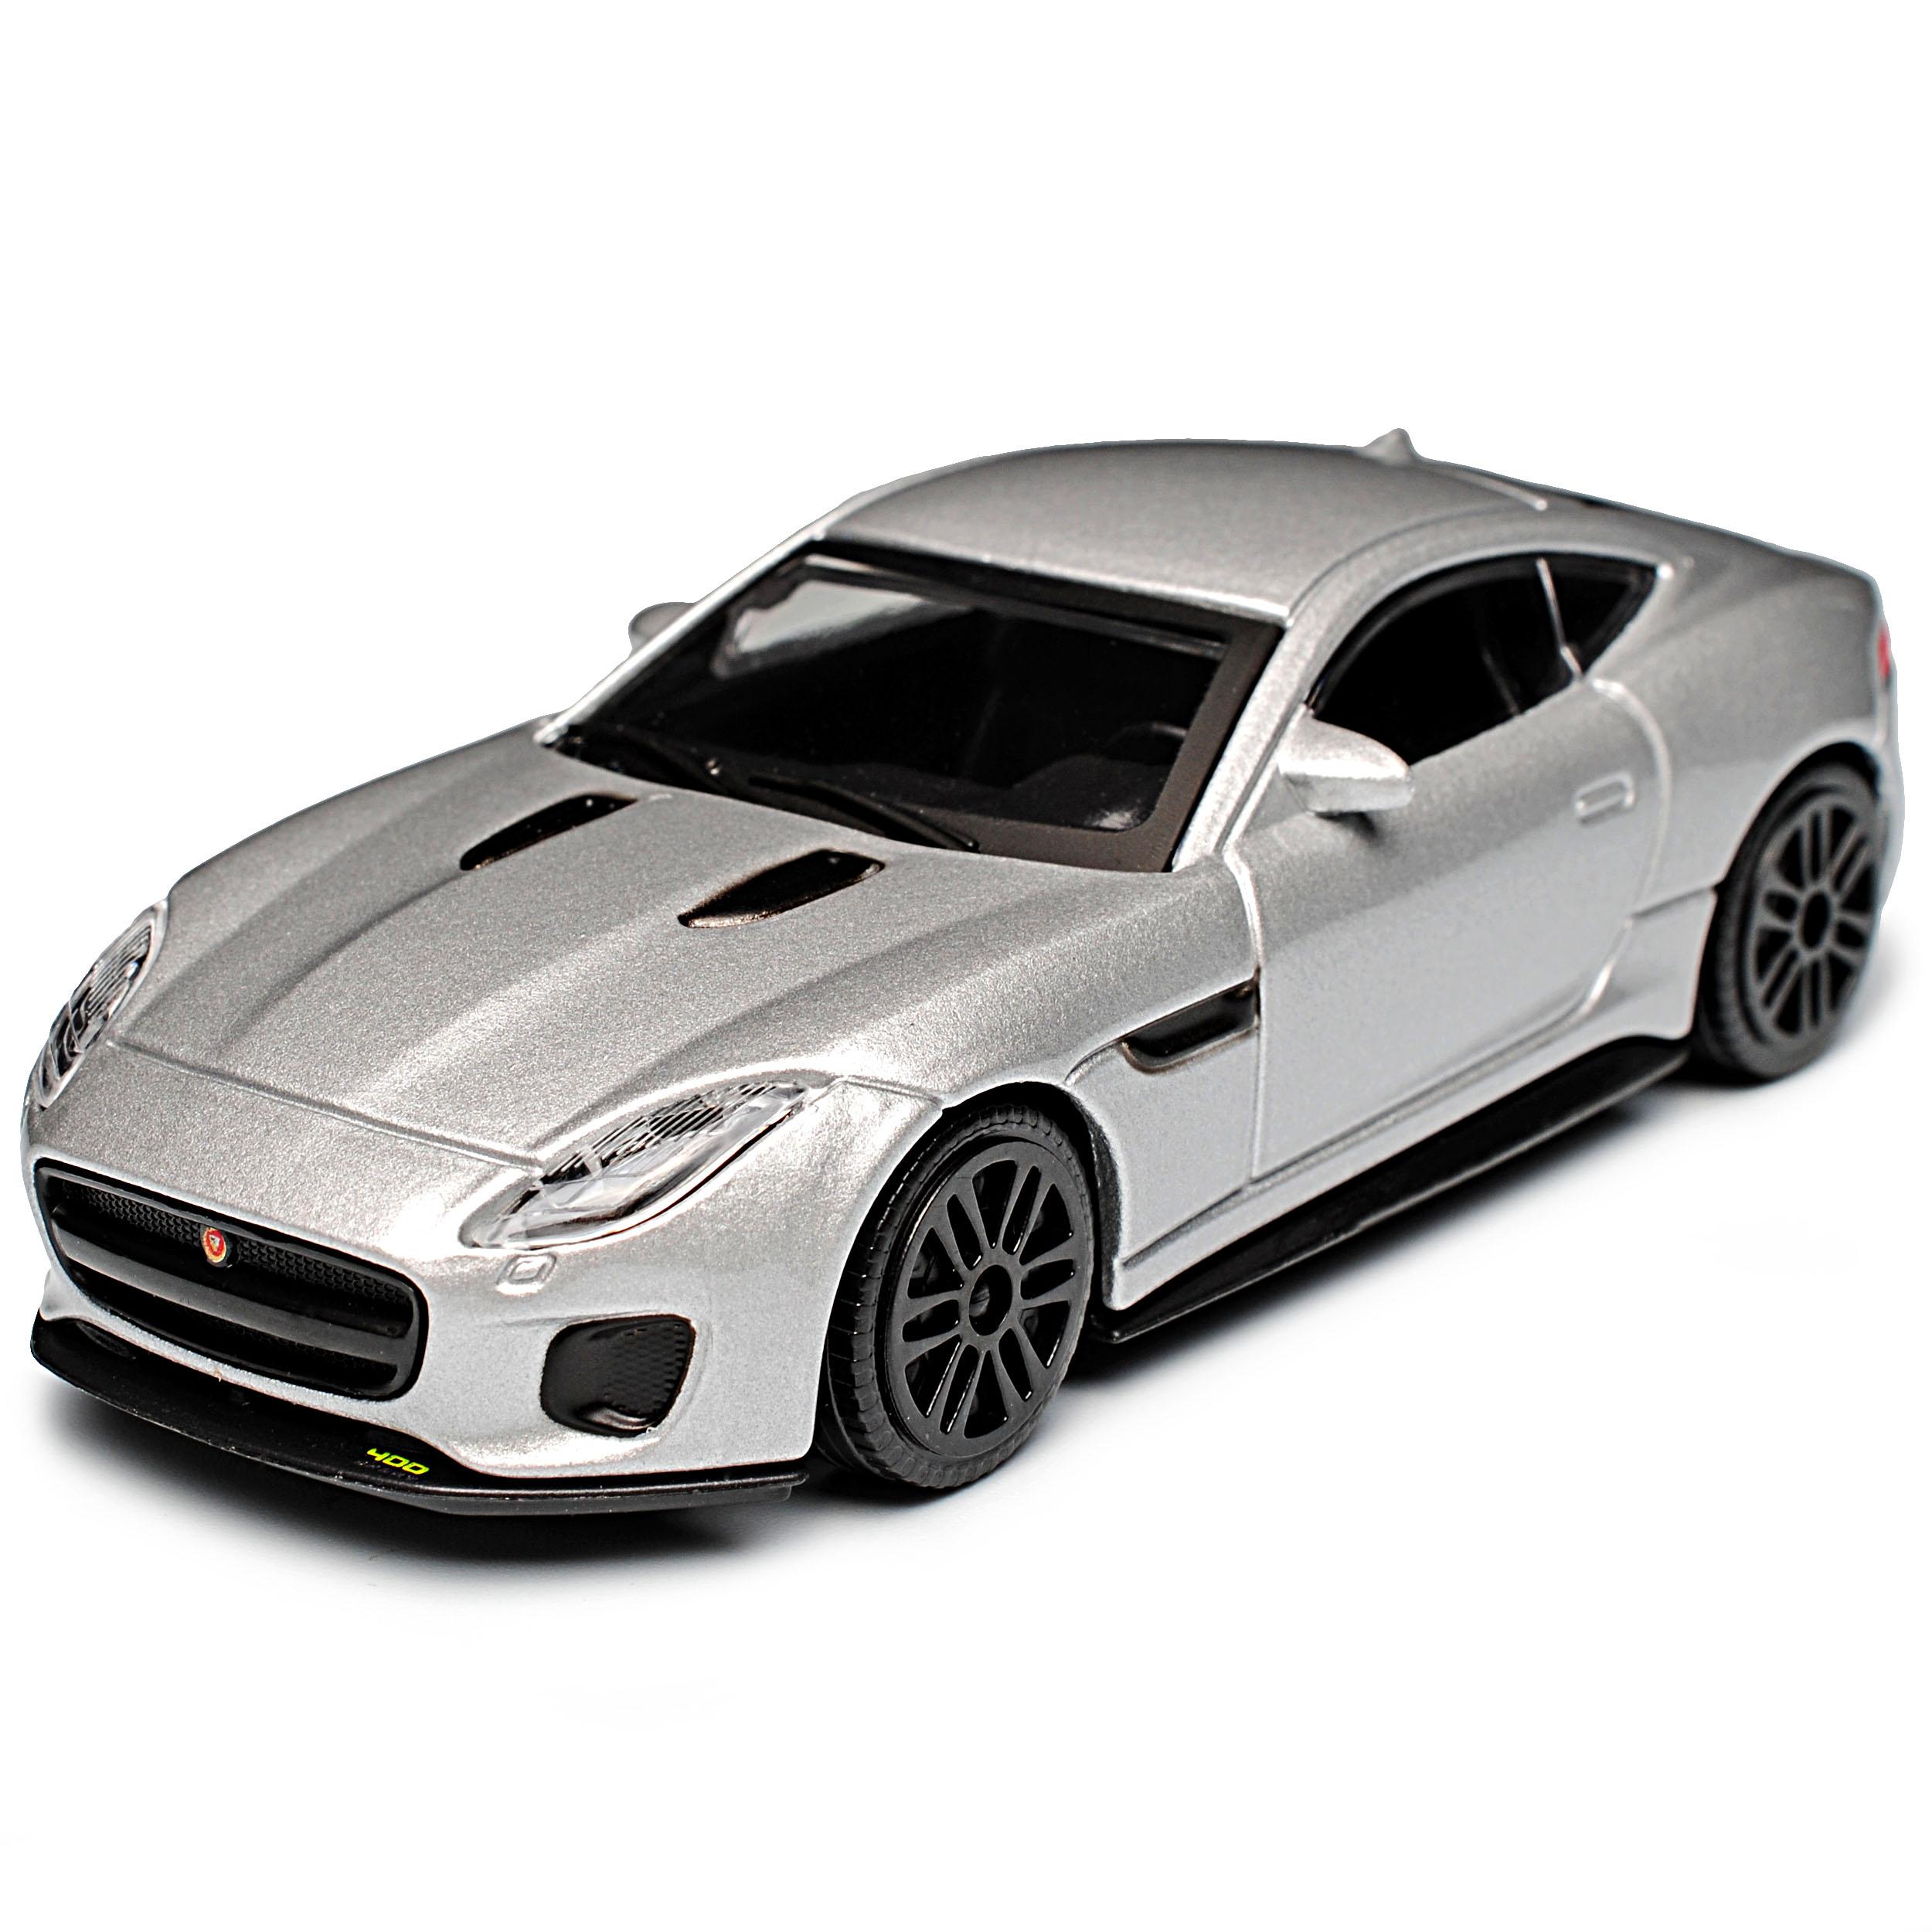 Jaguar F-Type Coupe Silber Ab 2013 1//43 Bburago Modell Auto mit oder ohne indi..